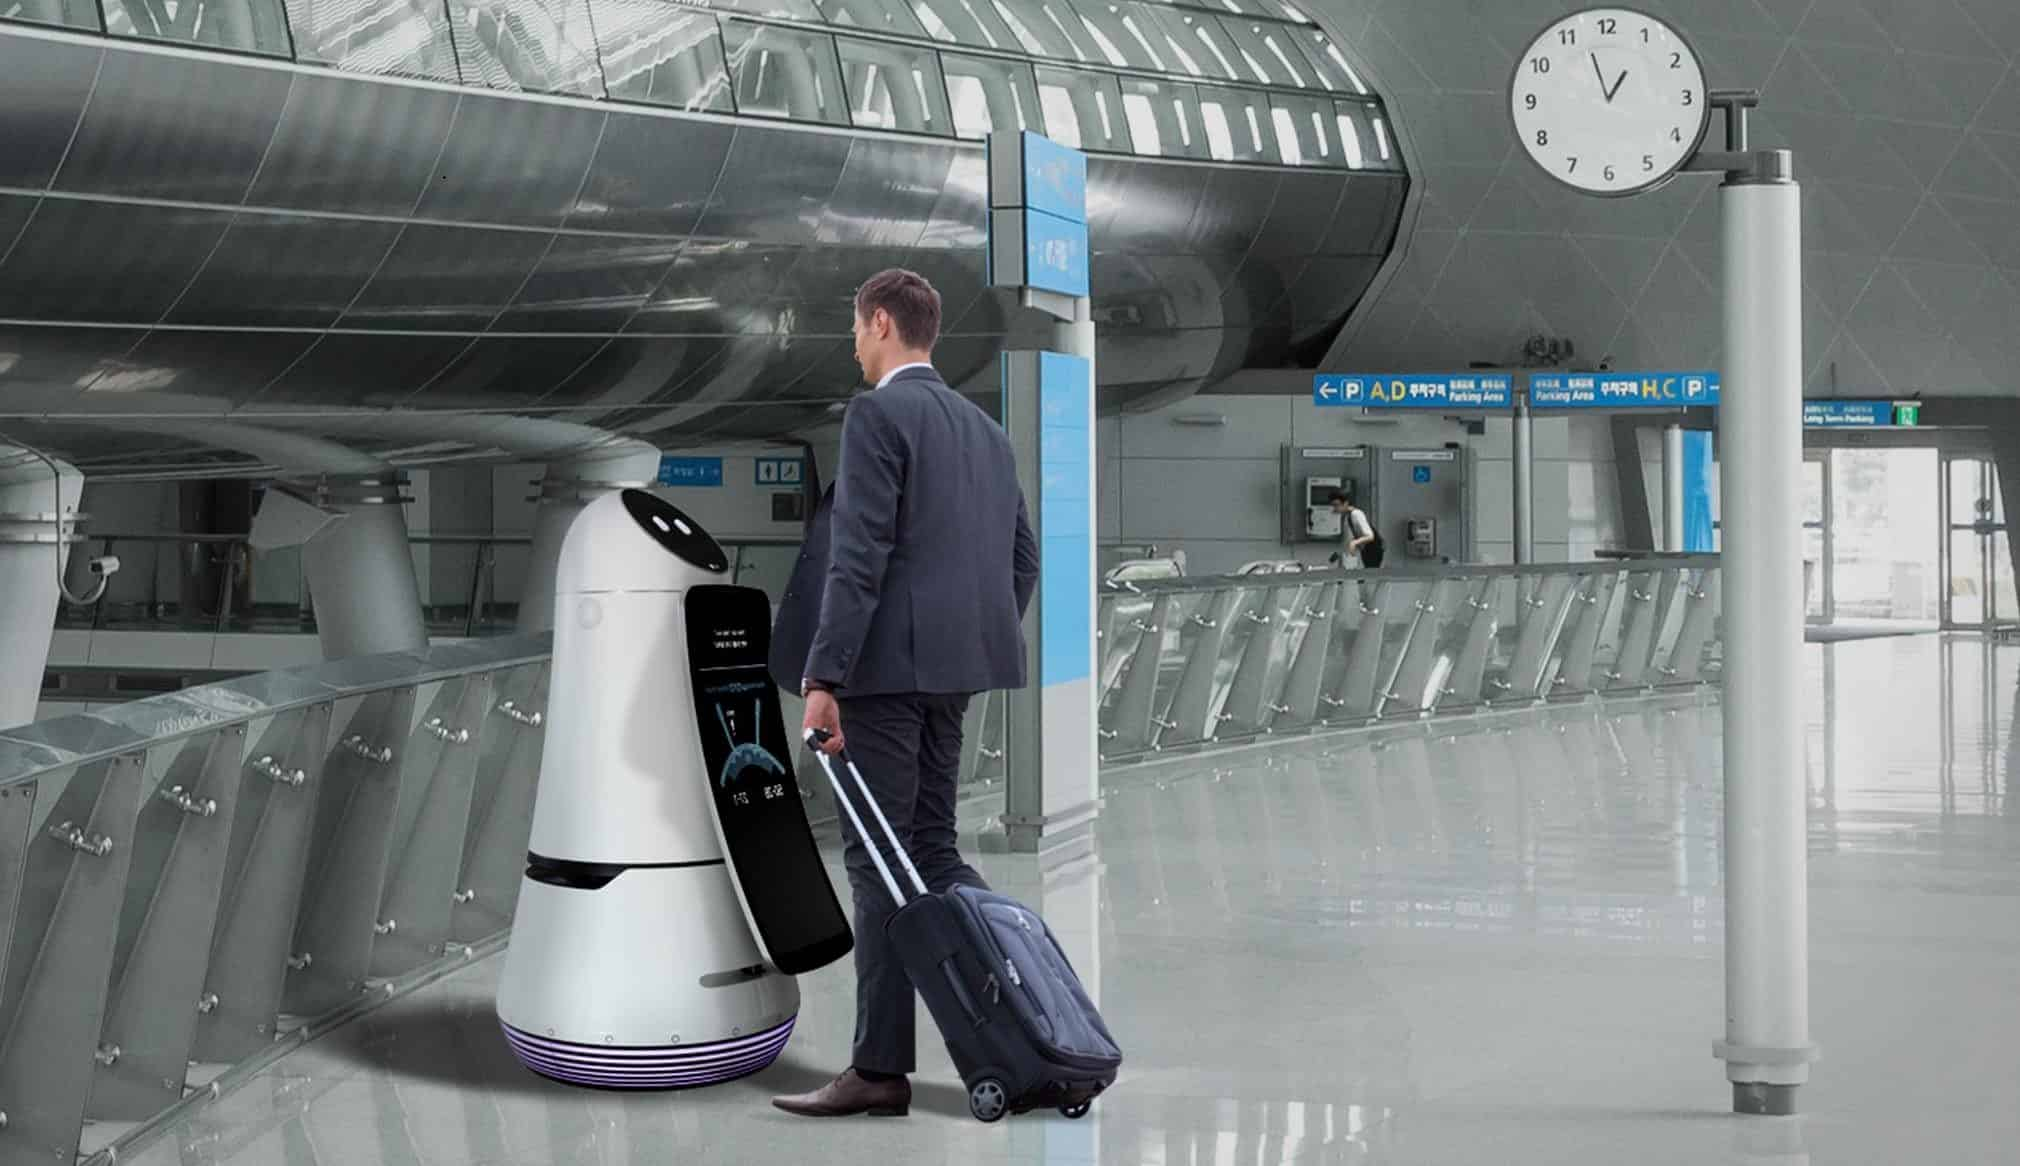 Airport Guide Robot 01 AH e1515002173419